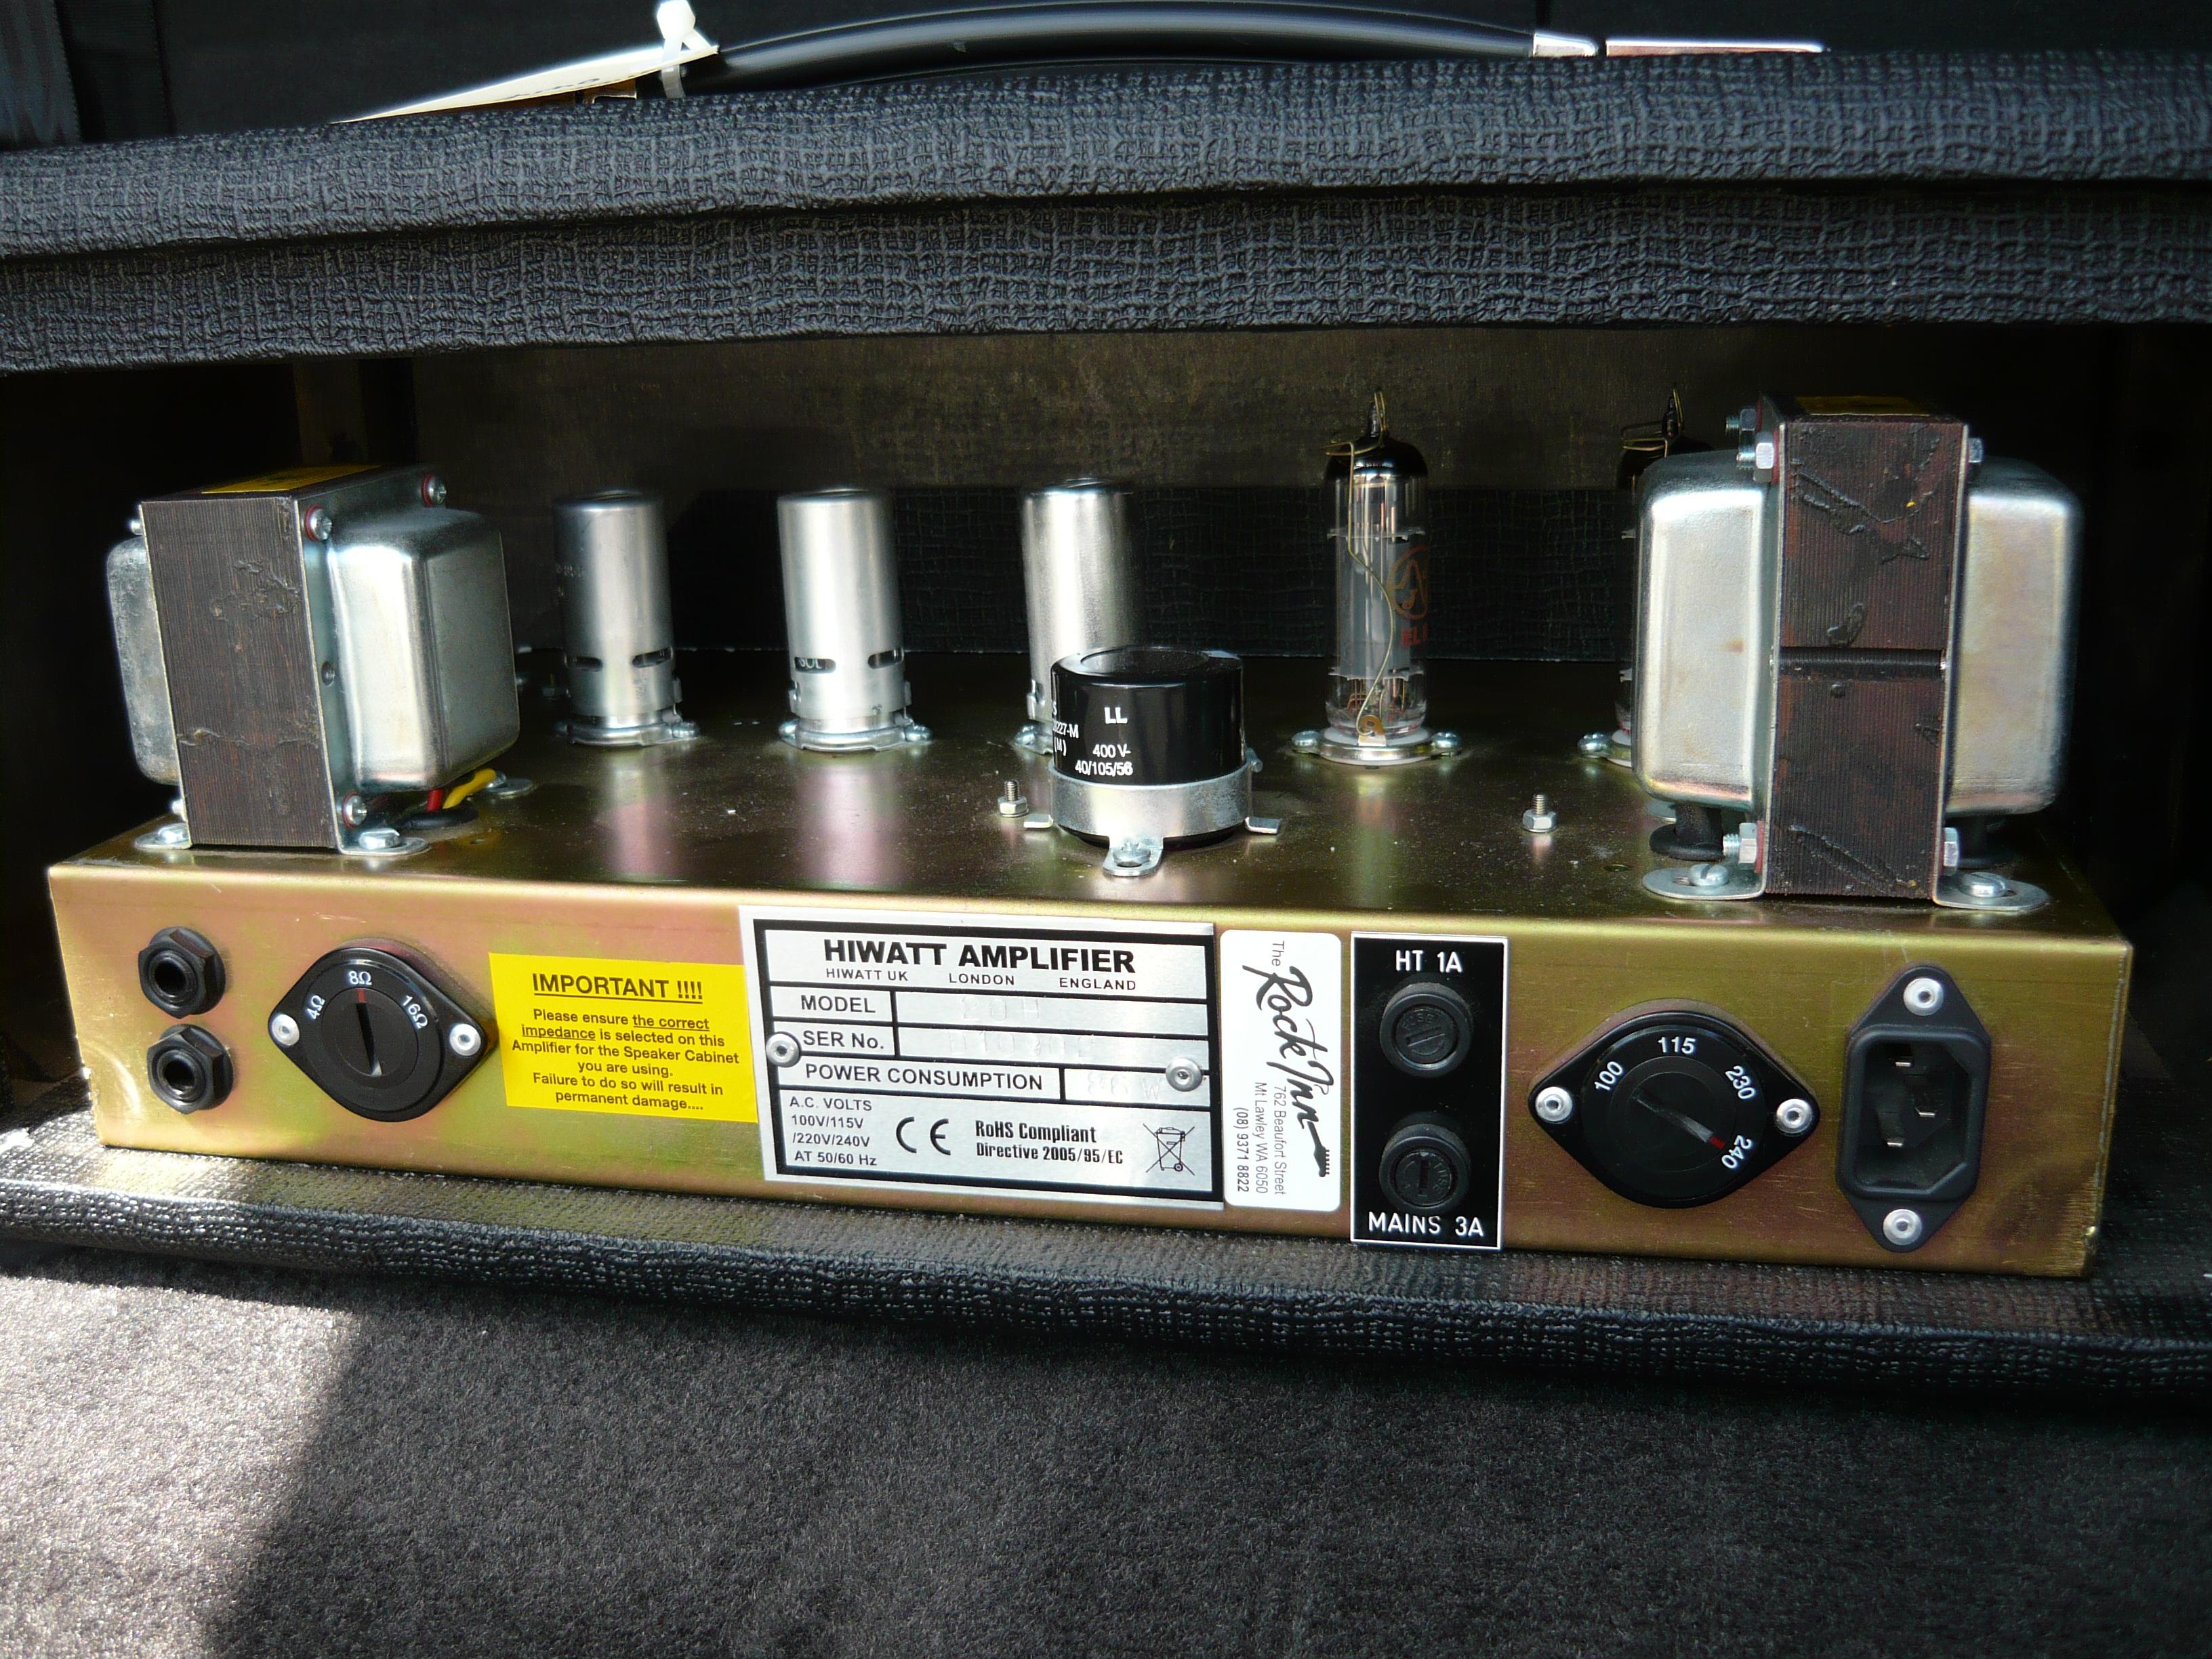 December 2013 Ivanrichards Higain Speaker Listening Amplifier Circuit Kit Aa5 Hiwatt 20h